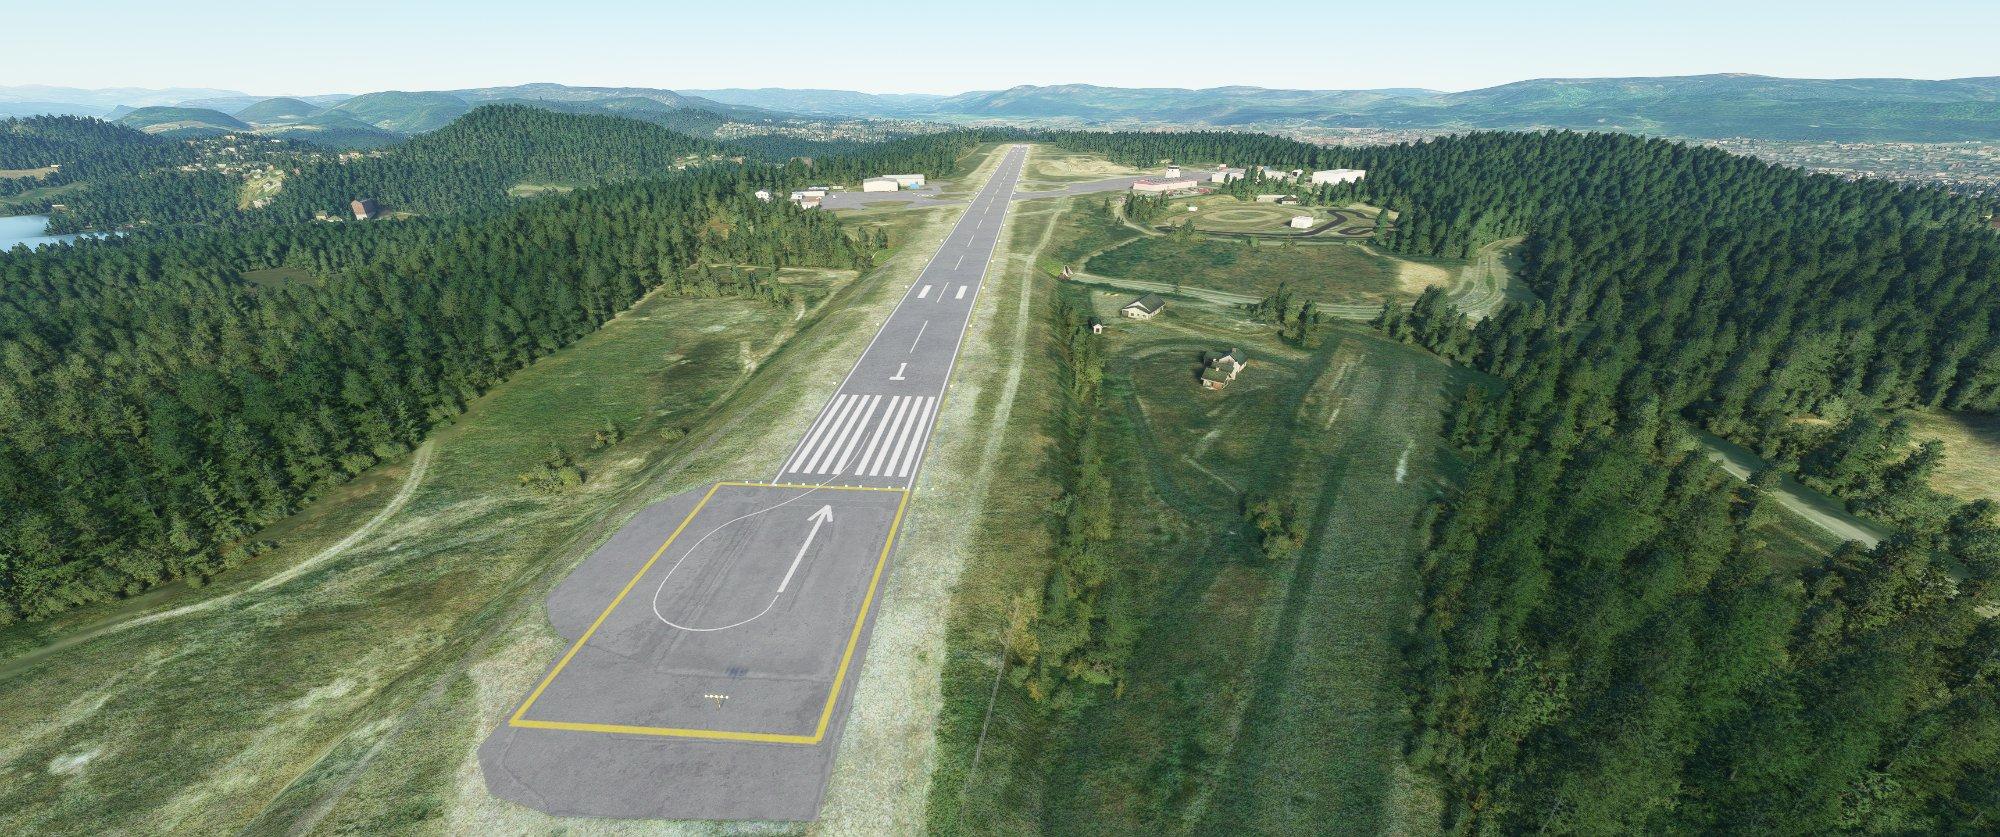 Microsoft Flight Simulator Screenshot 2020.10.30 - 16.25.46.34.jpg